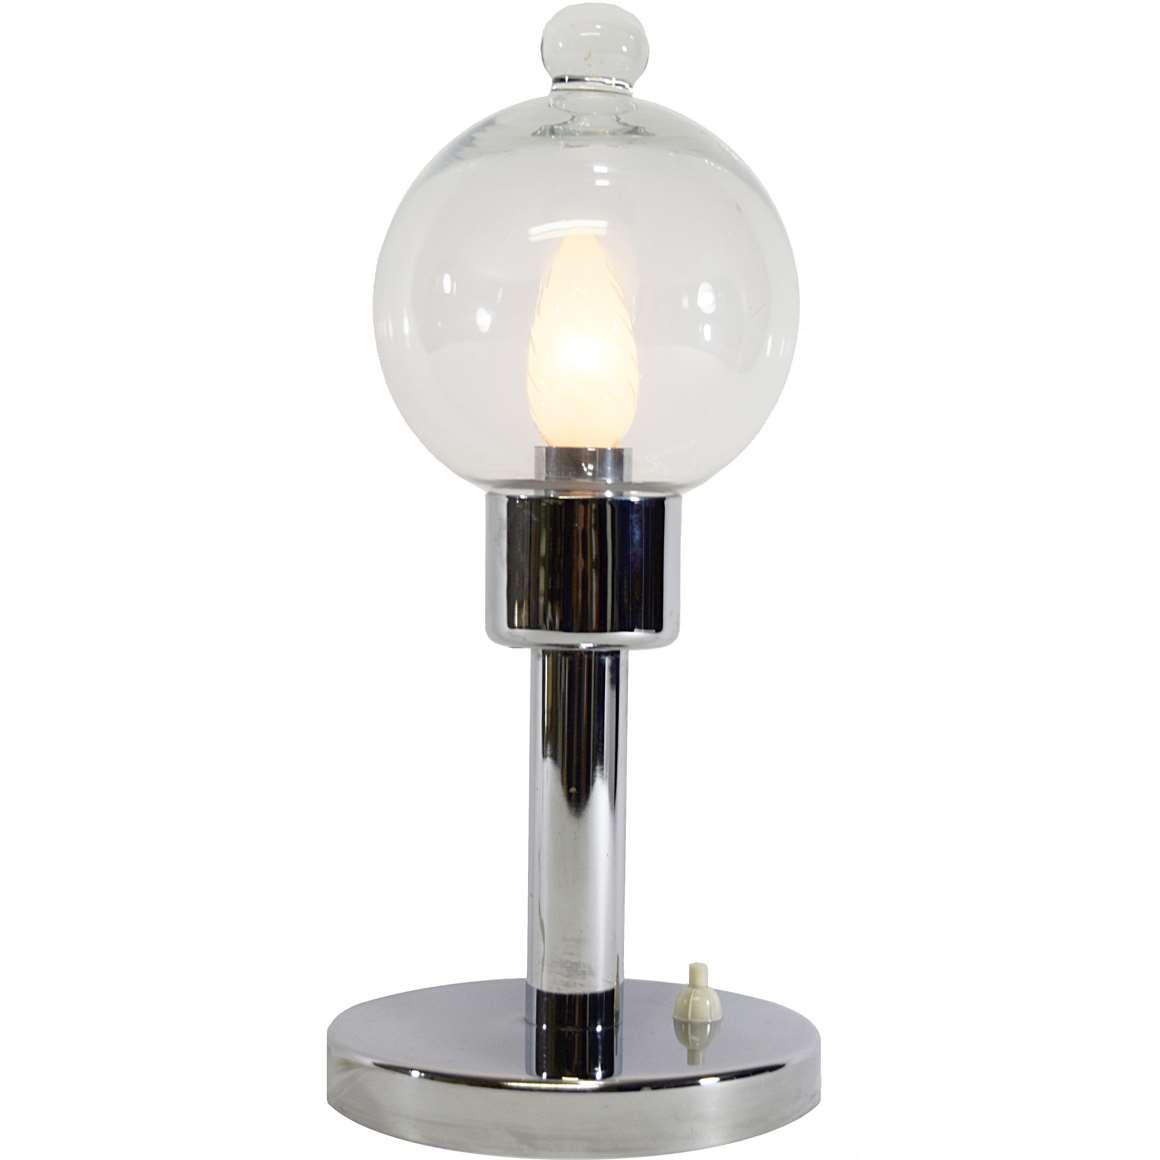 Florentine Droplet Table Lamp